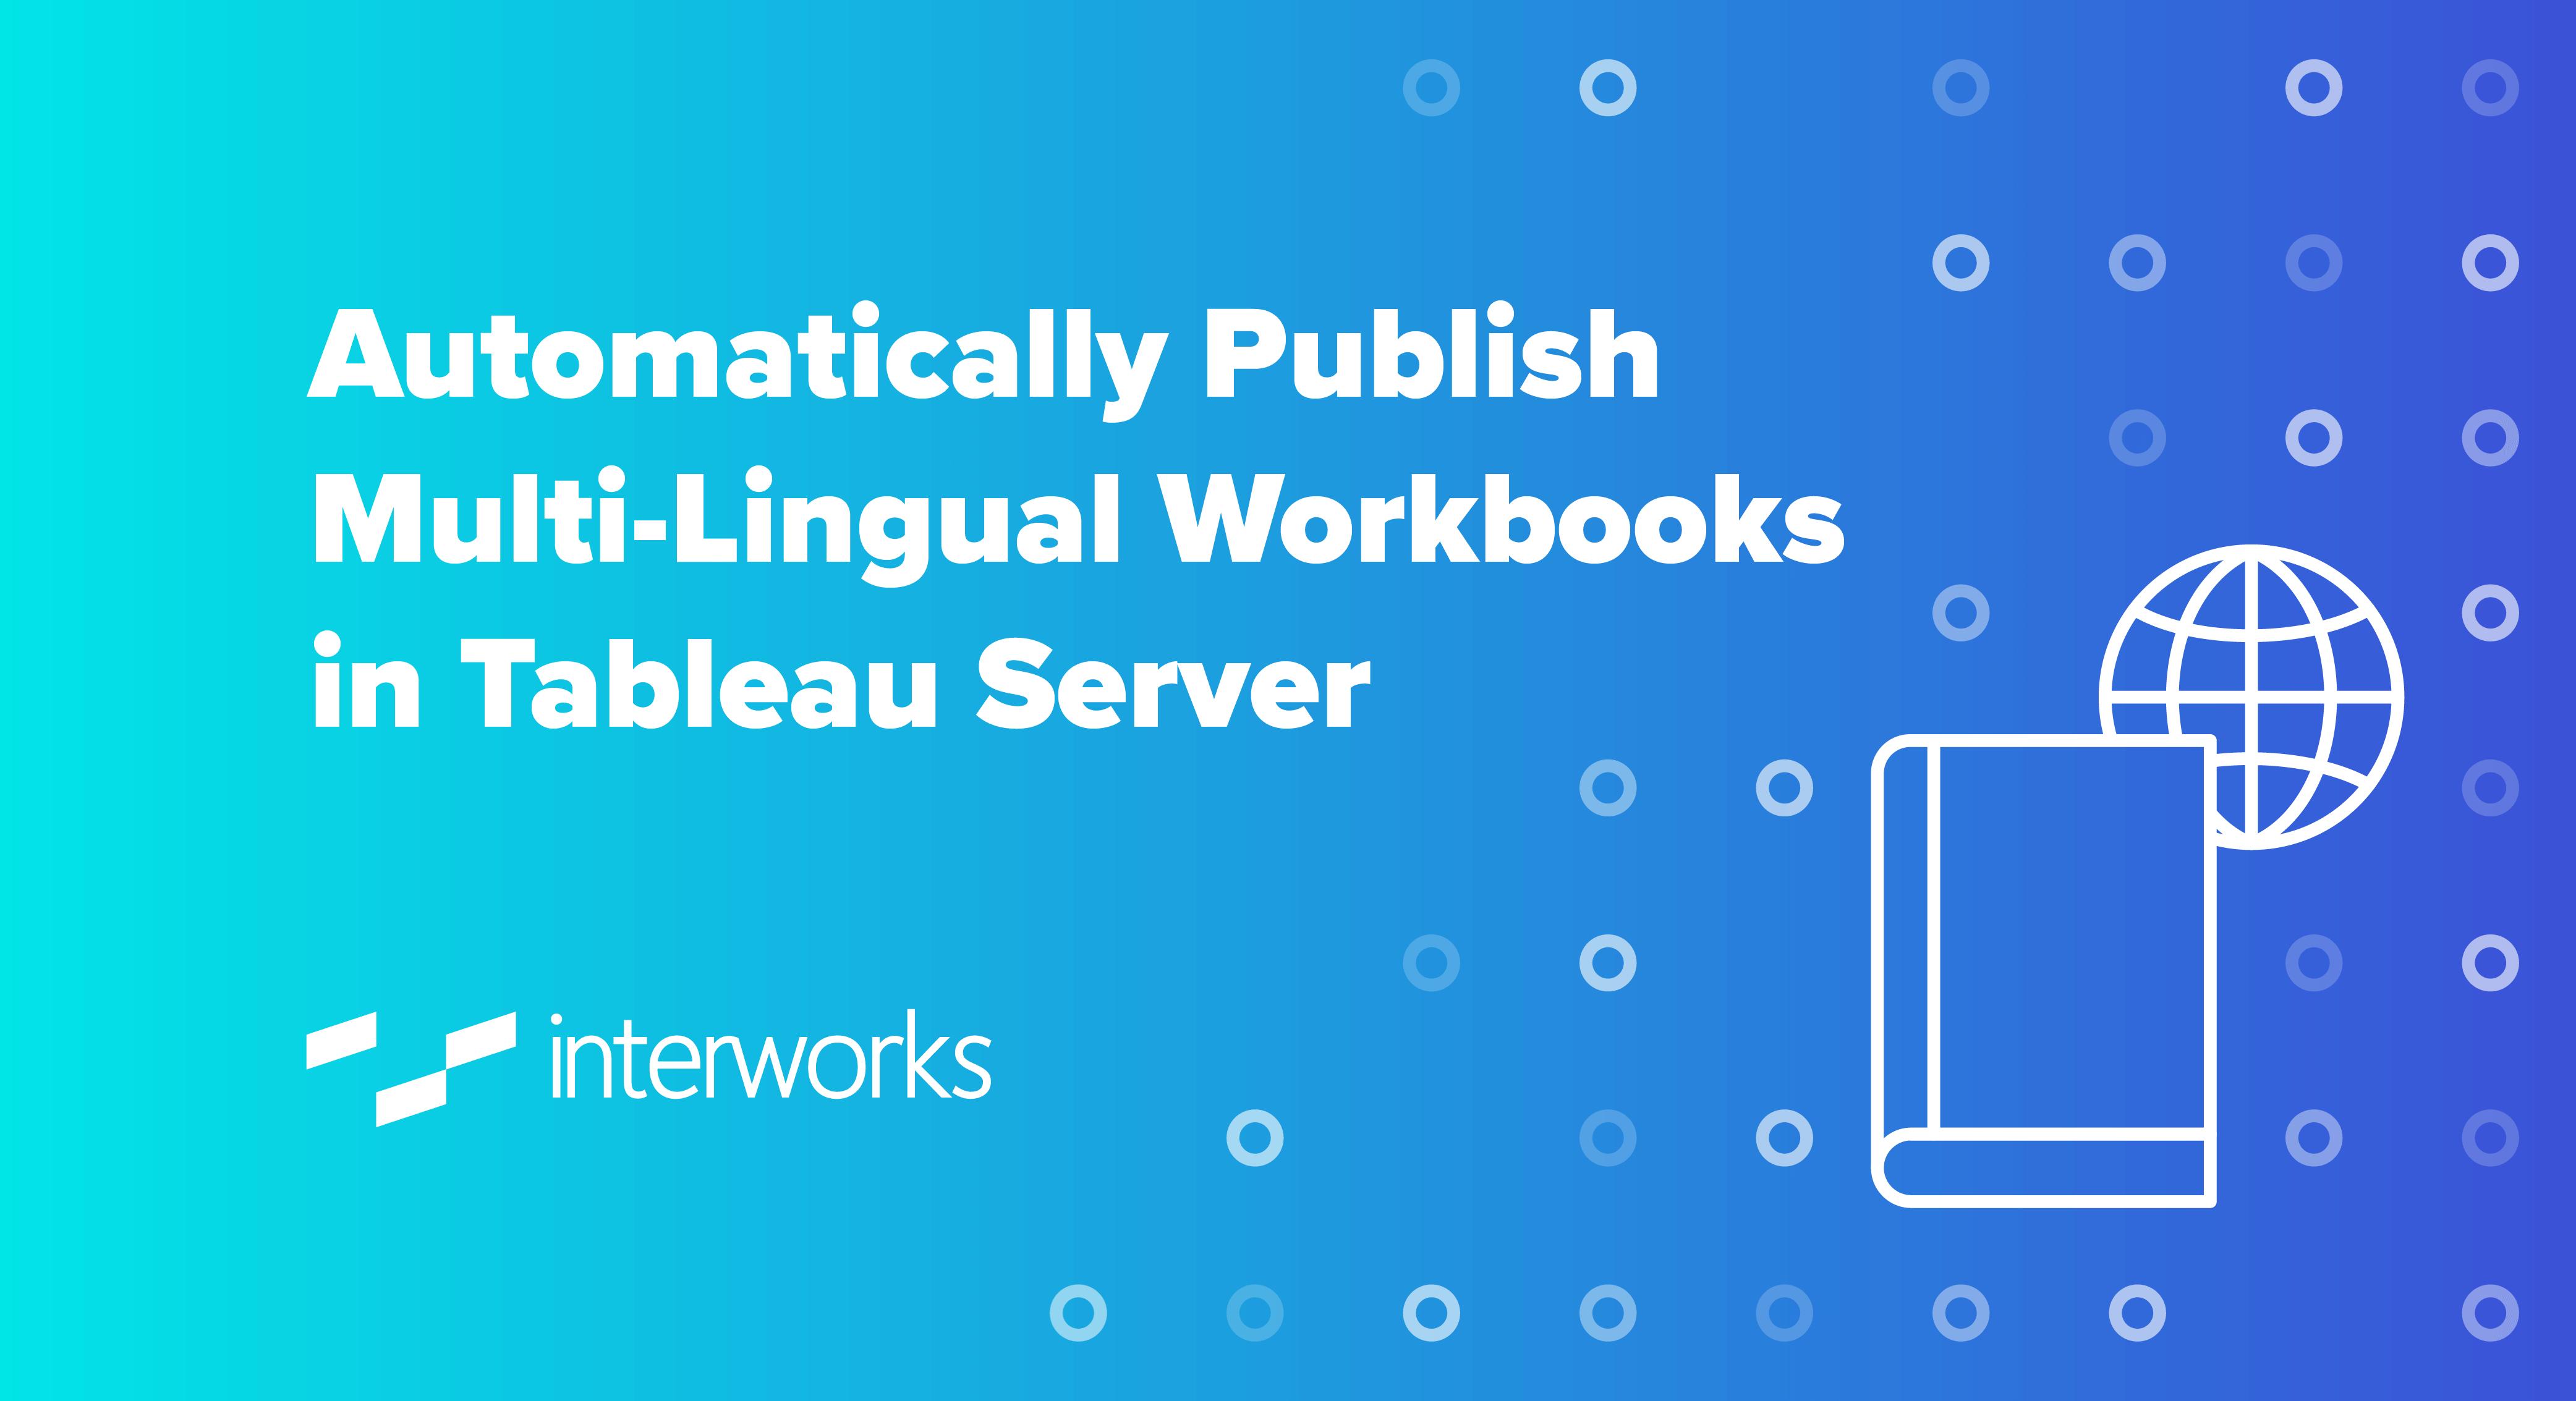 Automatically Publish Multi-Lingual Workbooks in Tableau Server